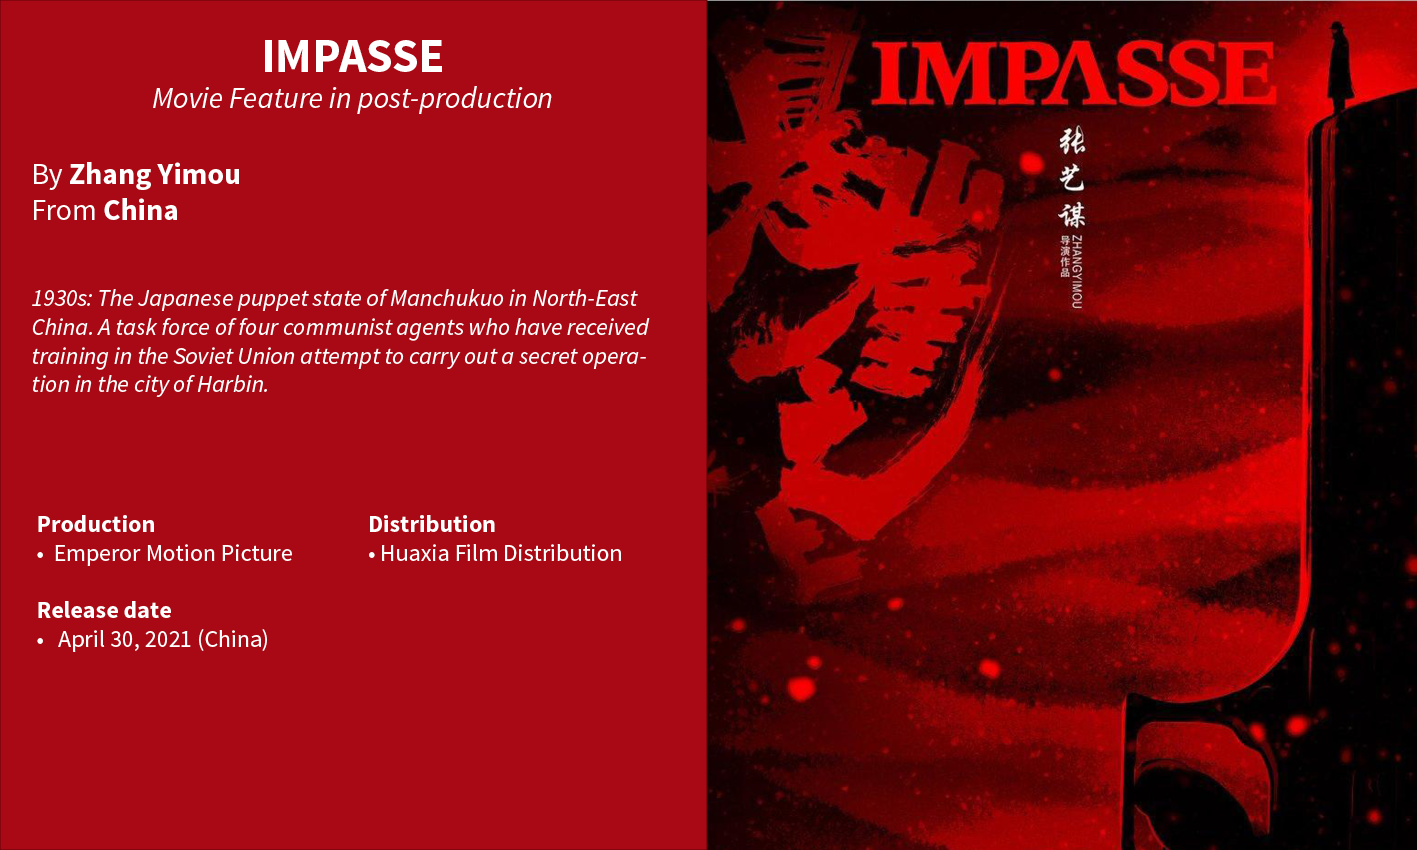 Impasse - Zhang Yimou